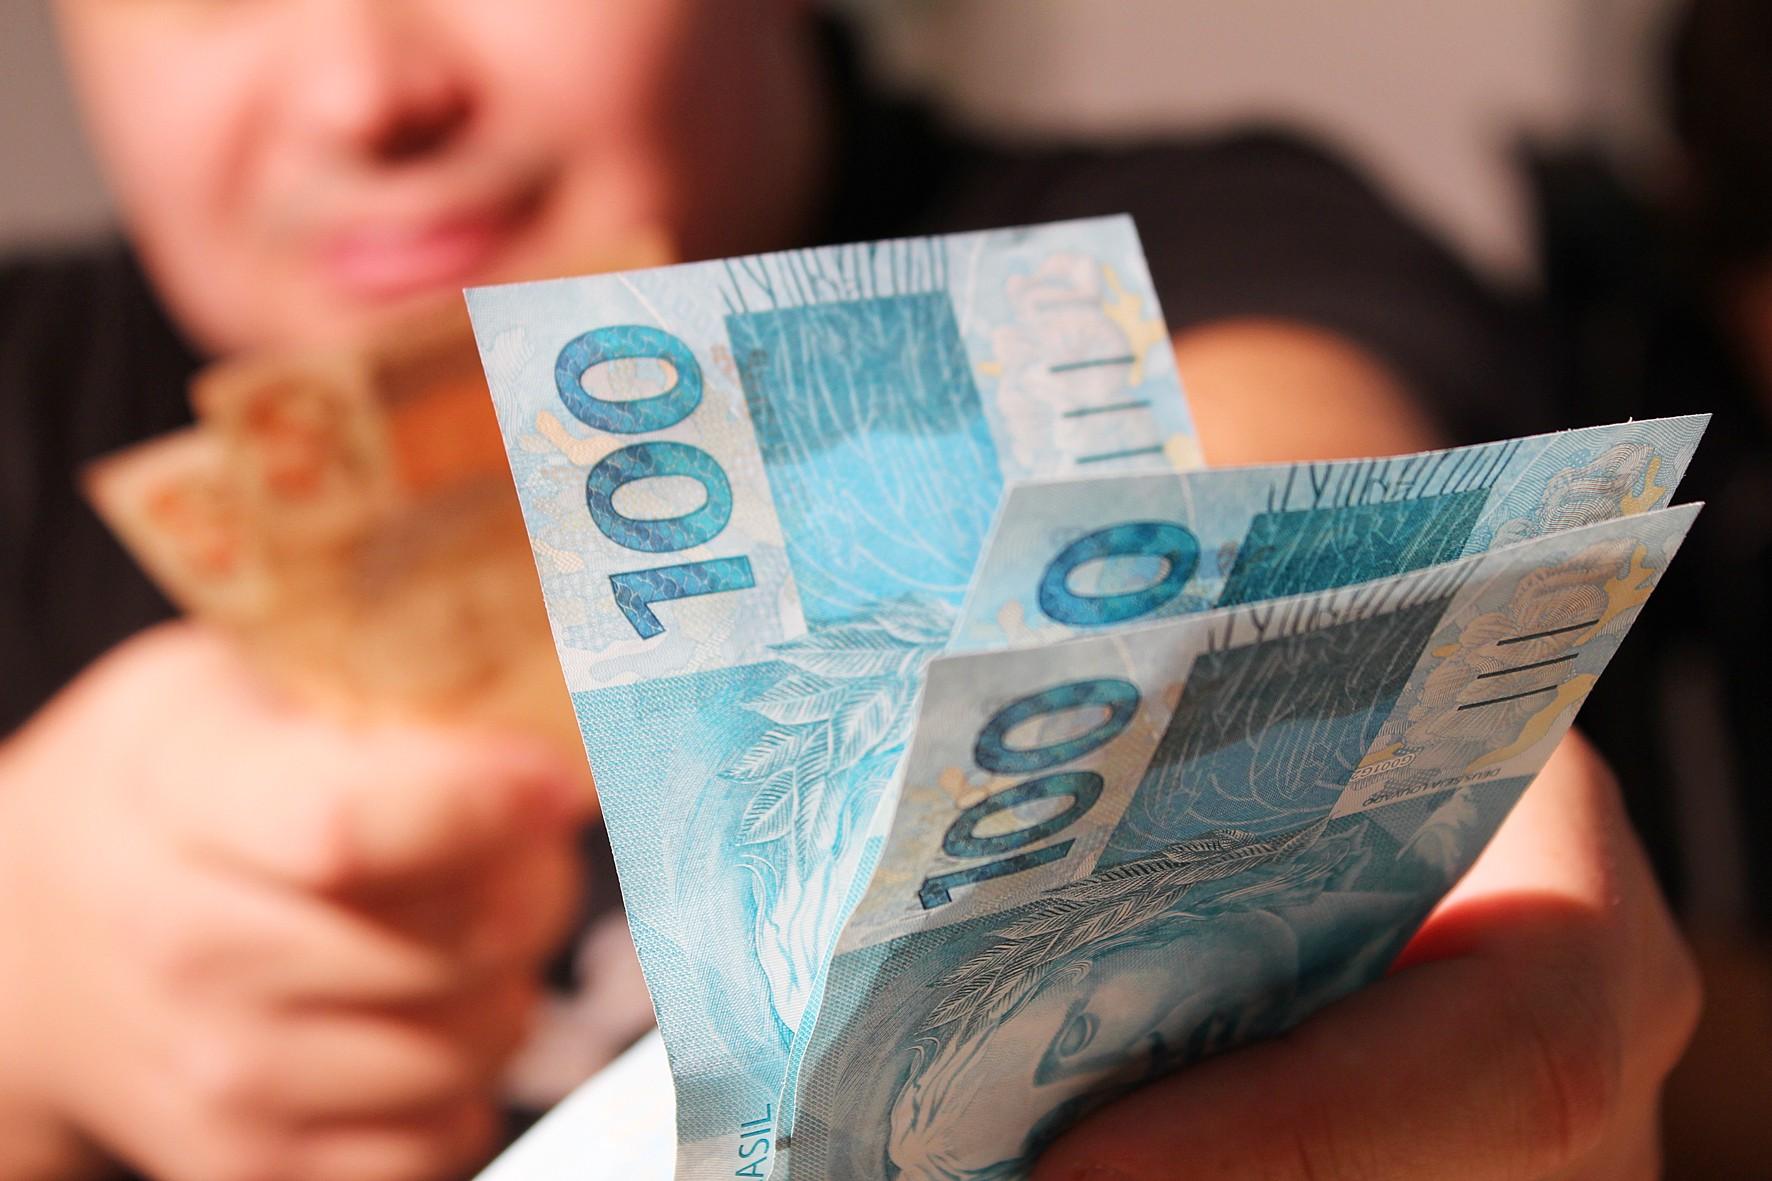 Pagamento Imposto de Renda 2019